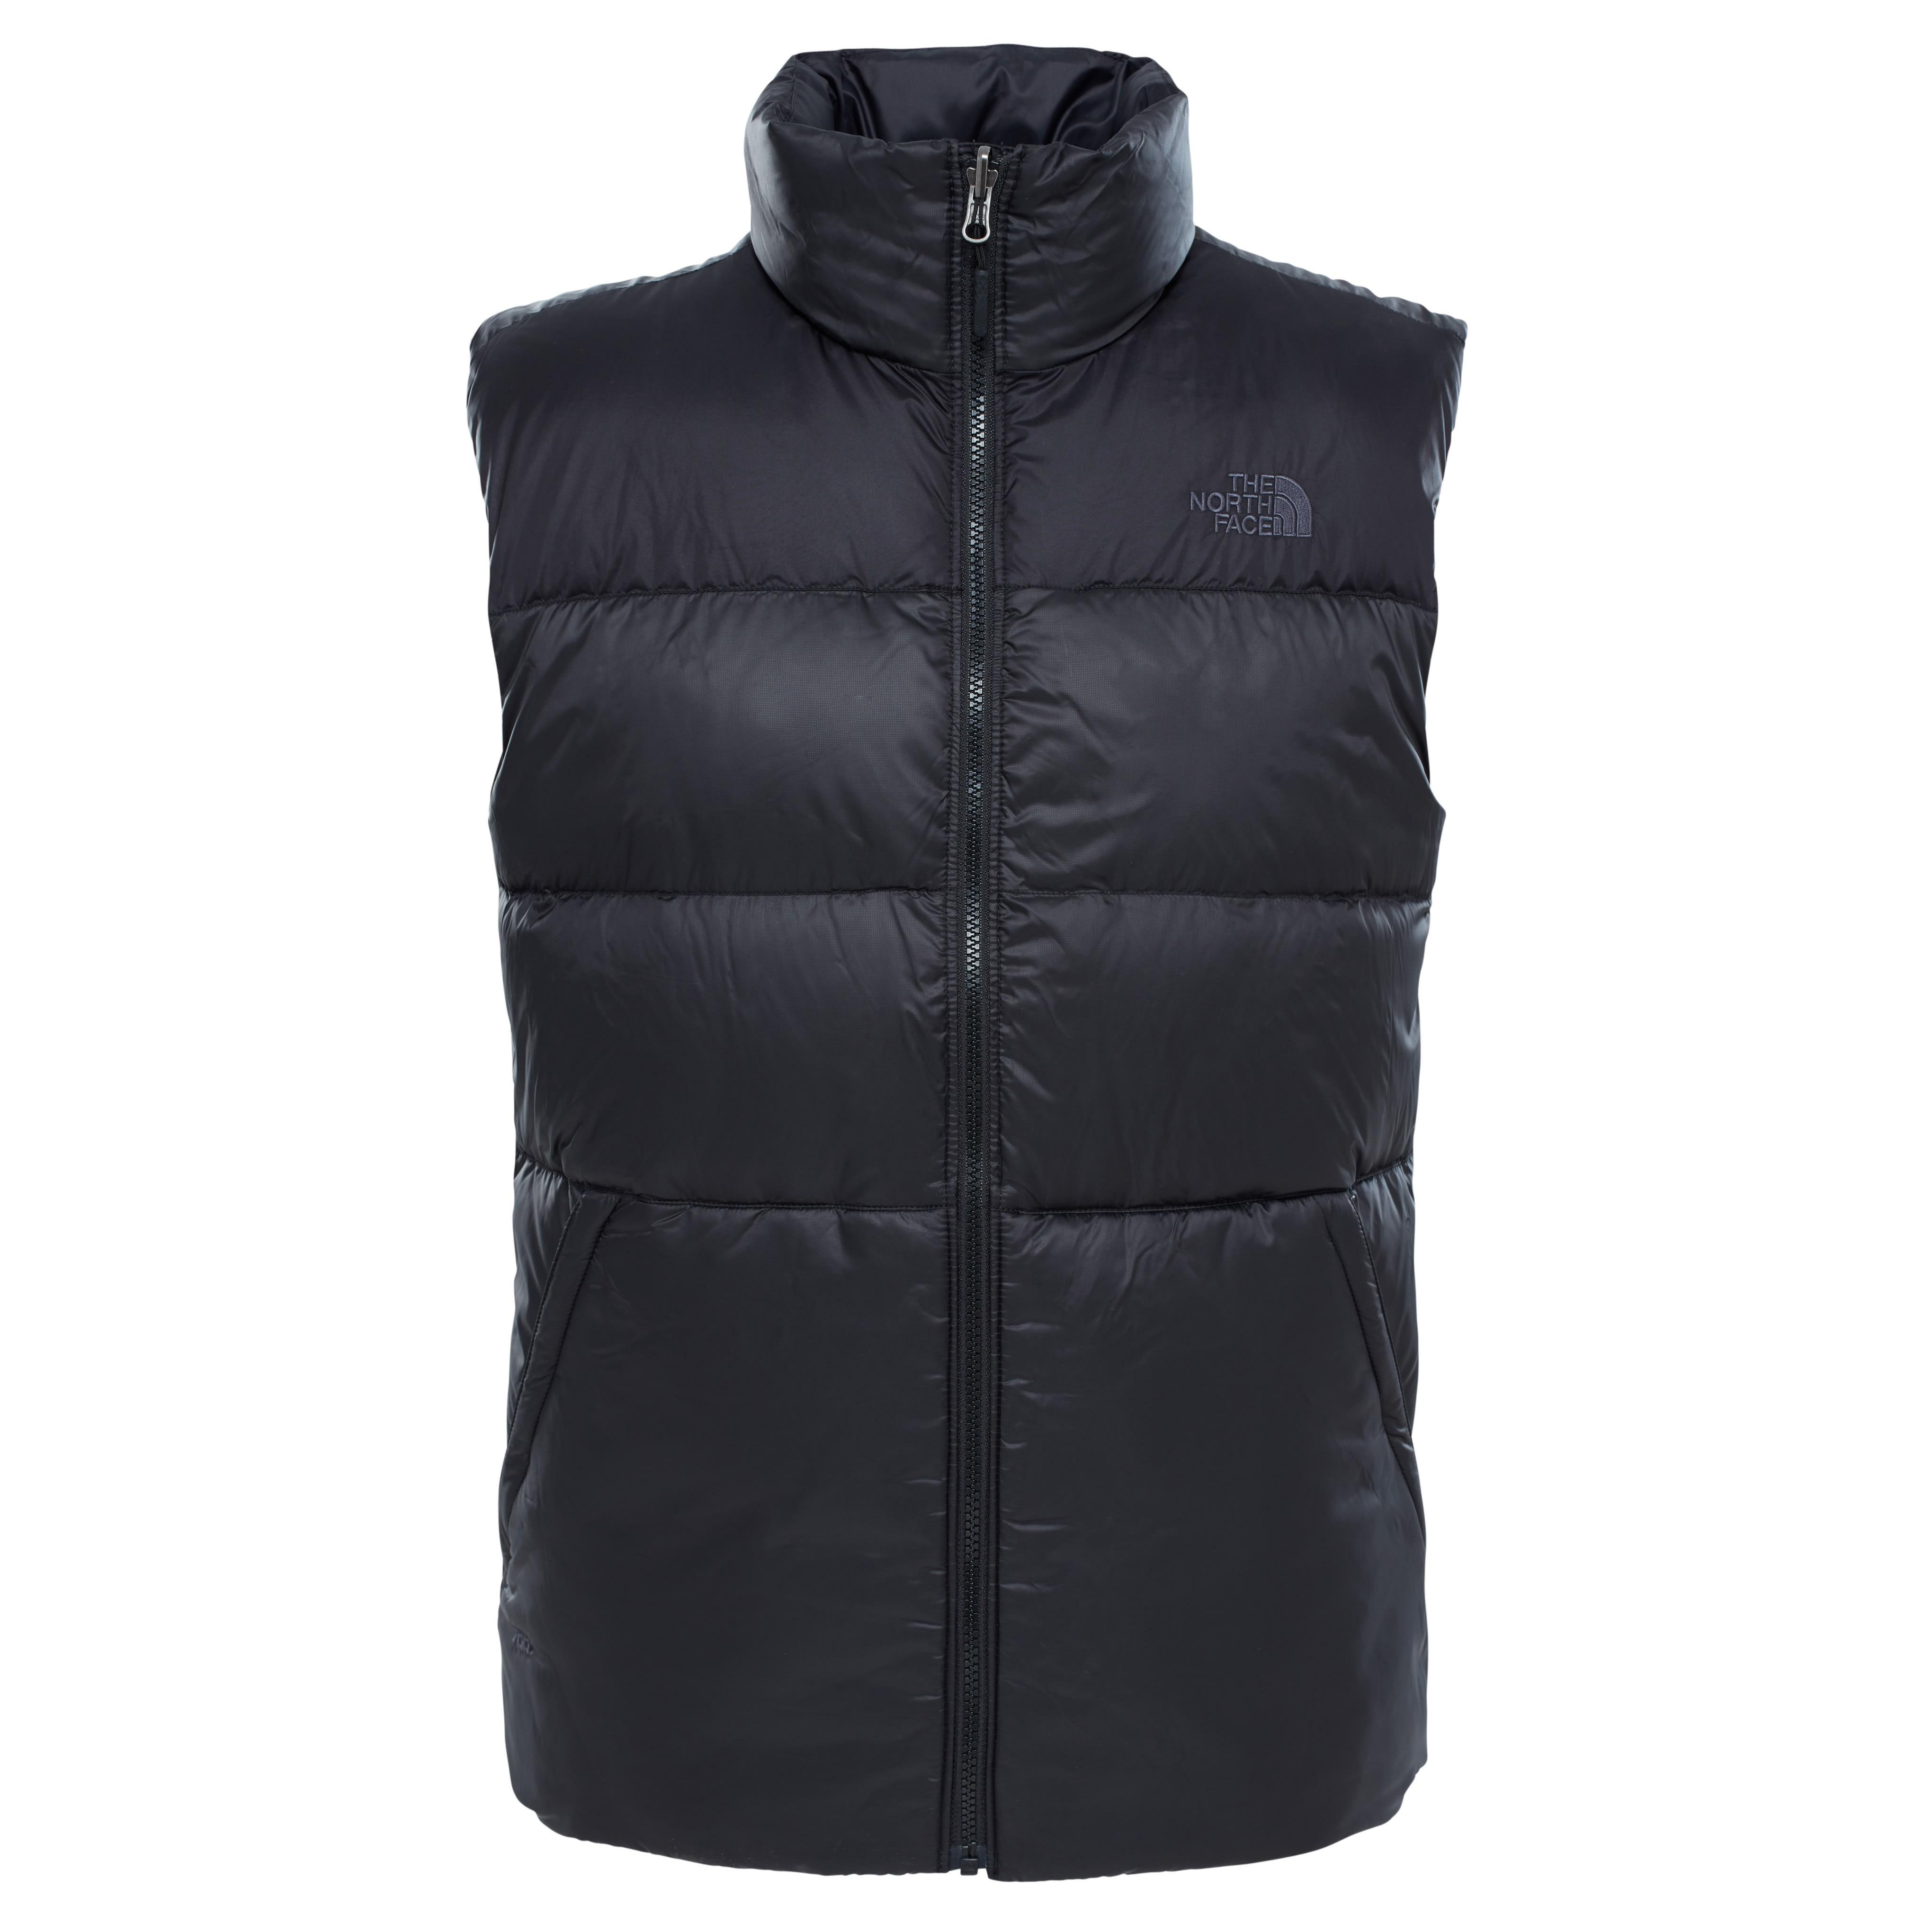 Kjøp The North Face Men's Nuptse III Jacket fra Outnorth